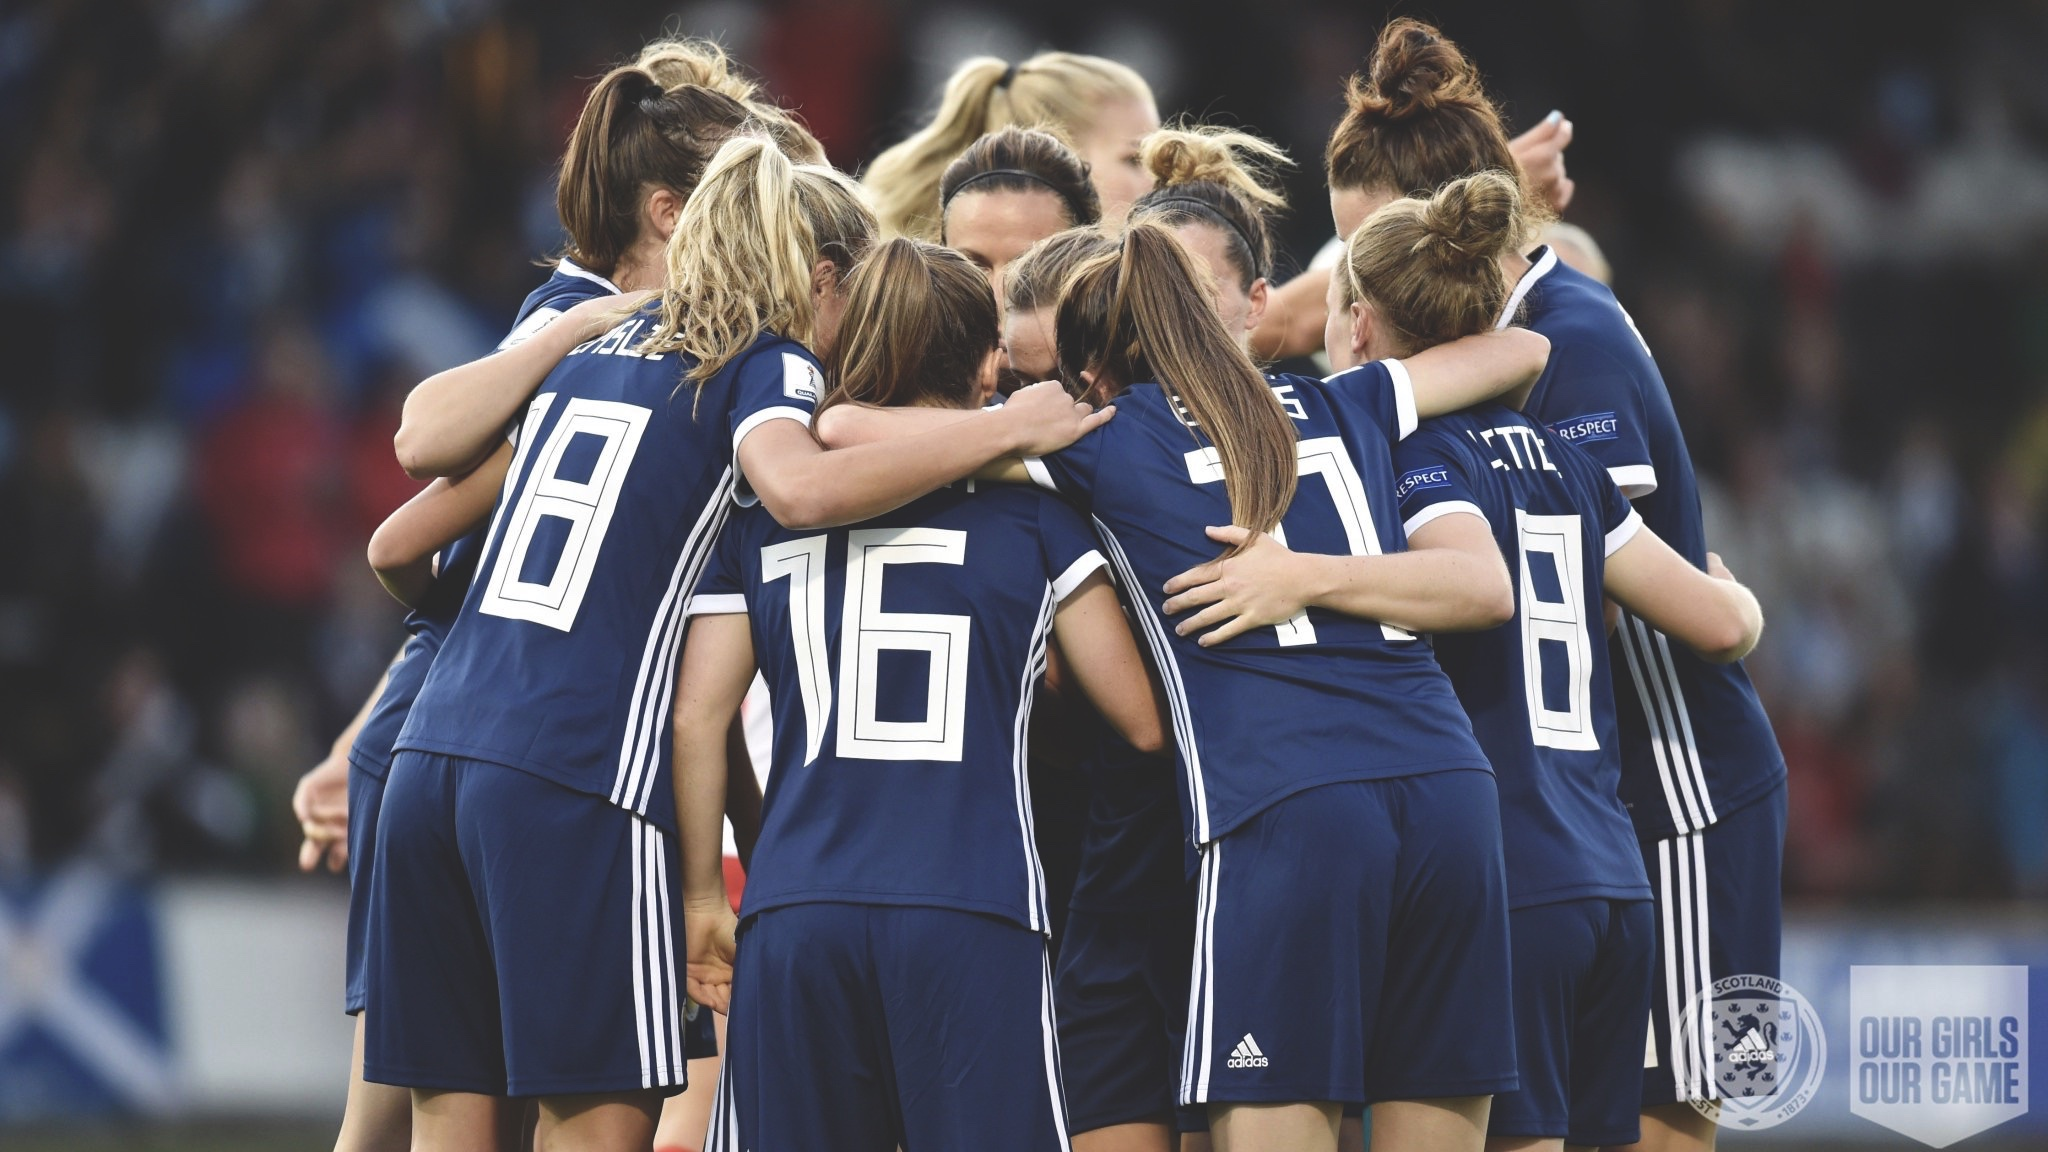 Scotland Women's National Team. Photo from @ScotlandNT